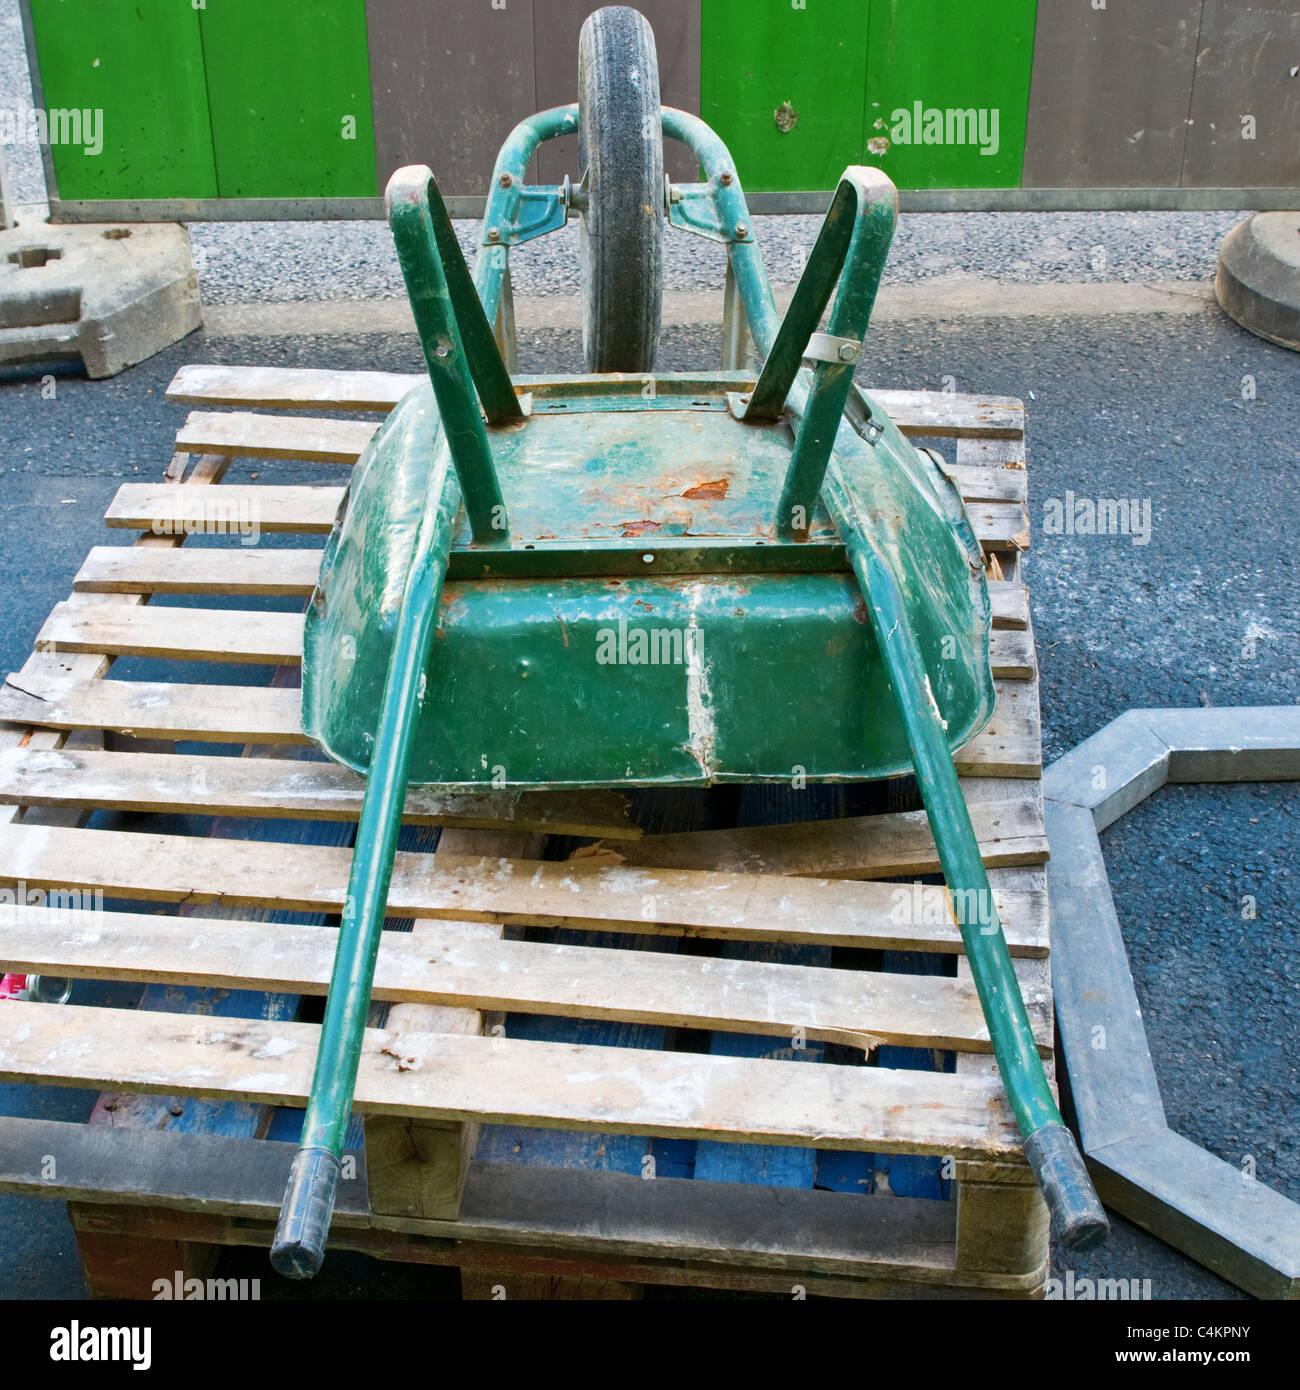 A workman's wheel-barrow on a pallet - Stock Image